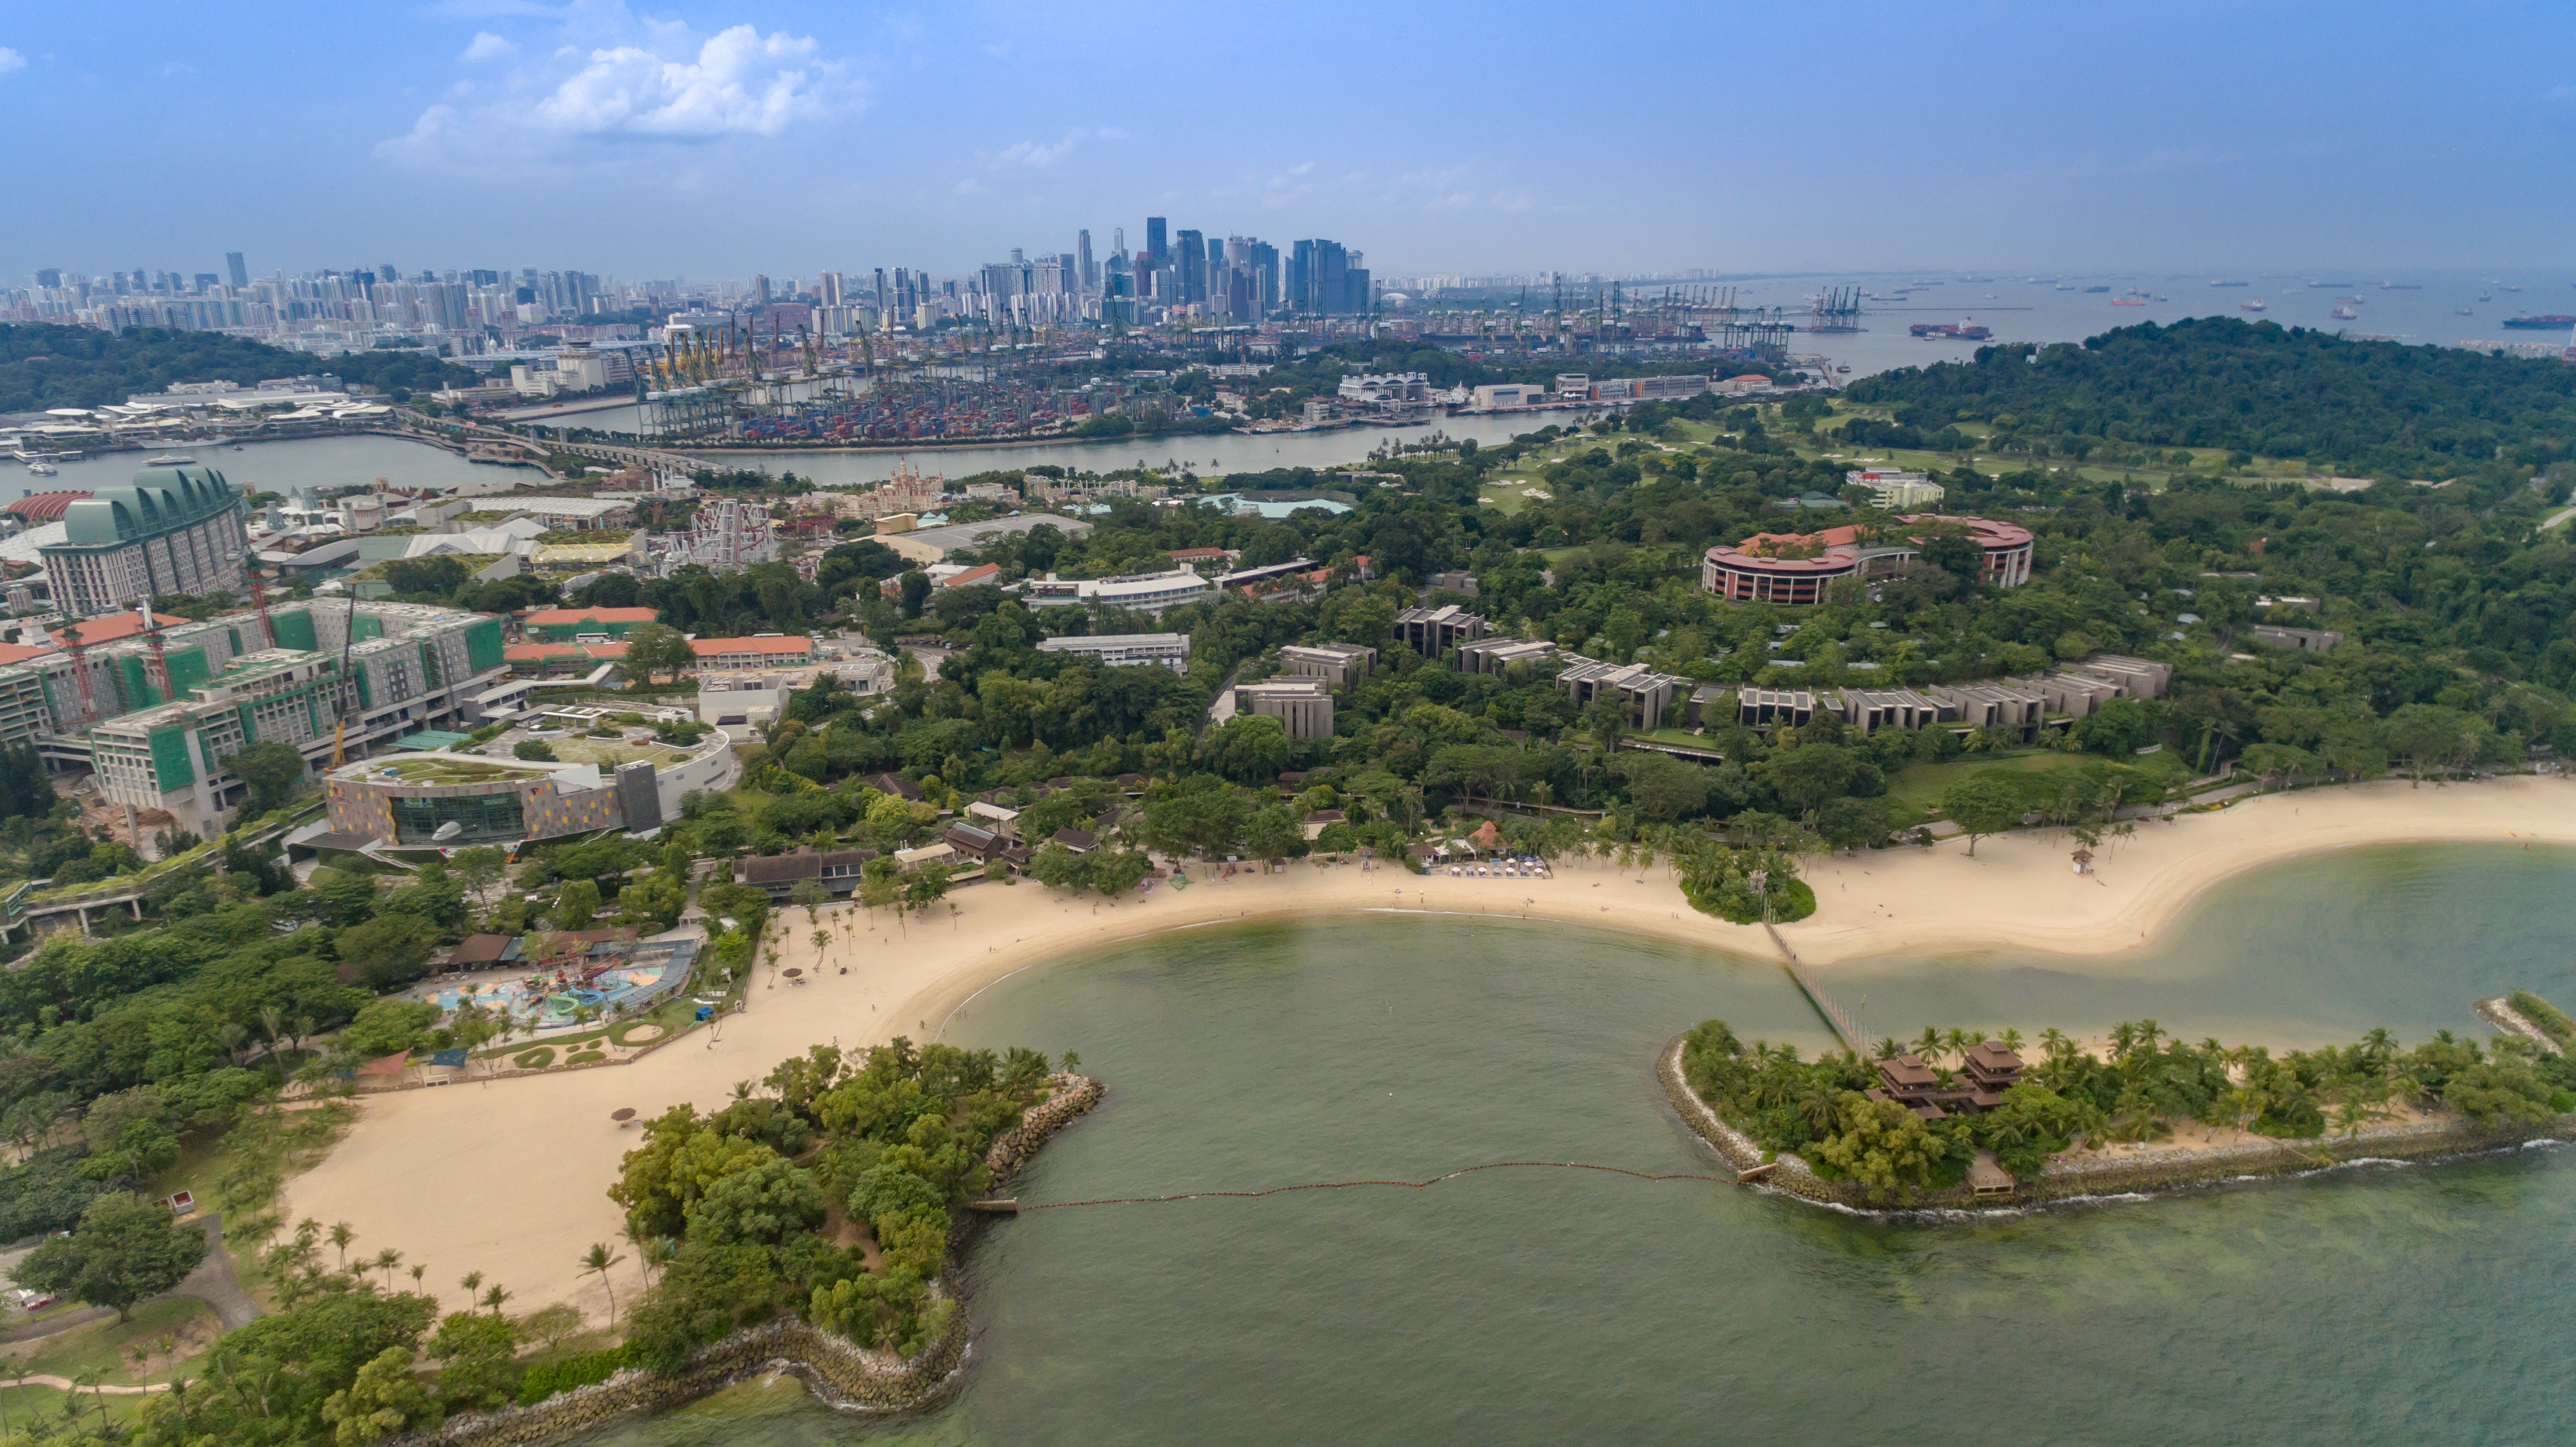 Palawan Beach Sentosa island Singapore (36363085920).jpg